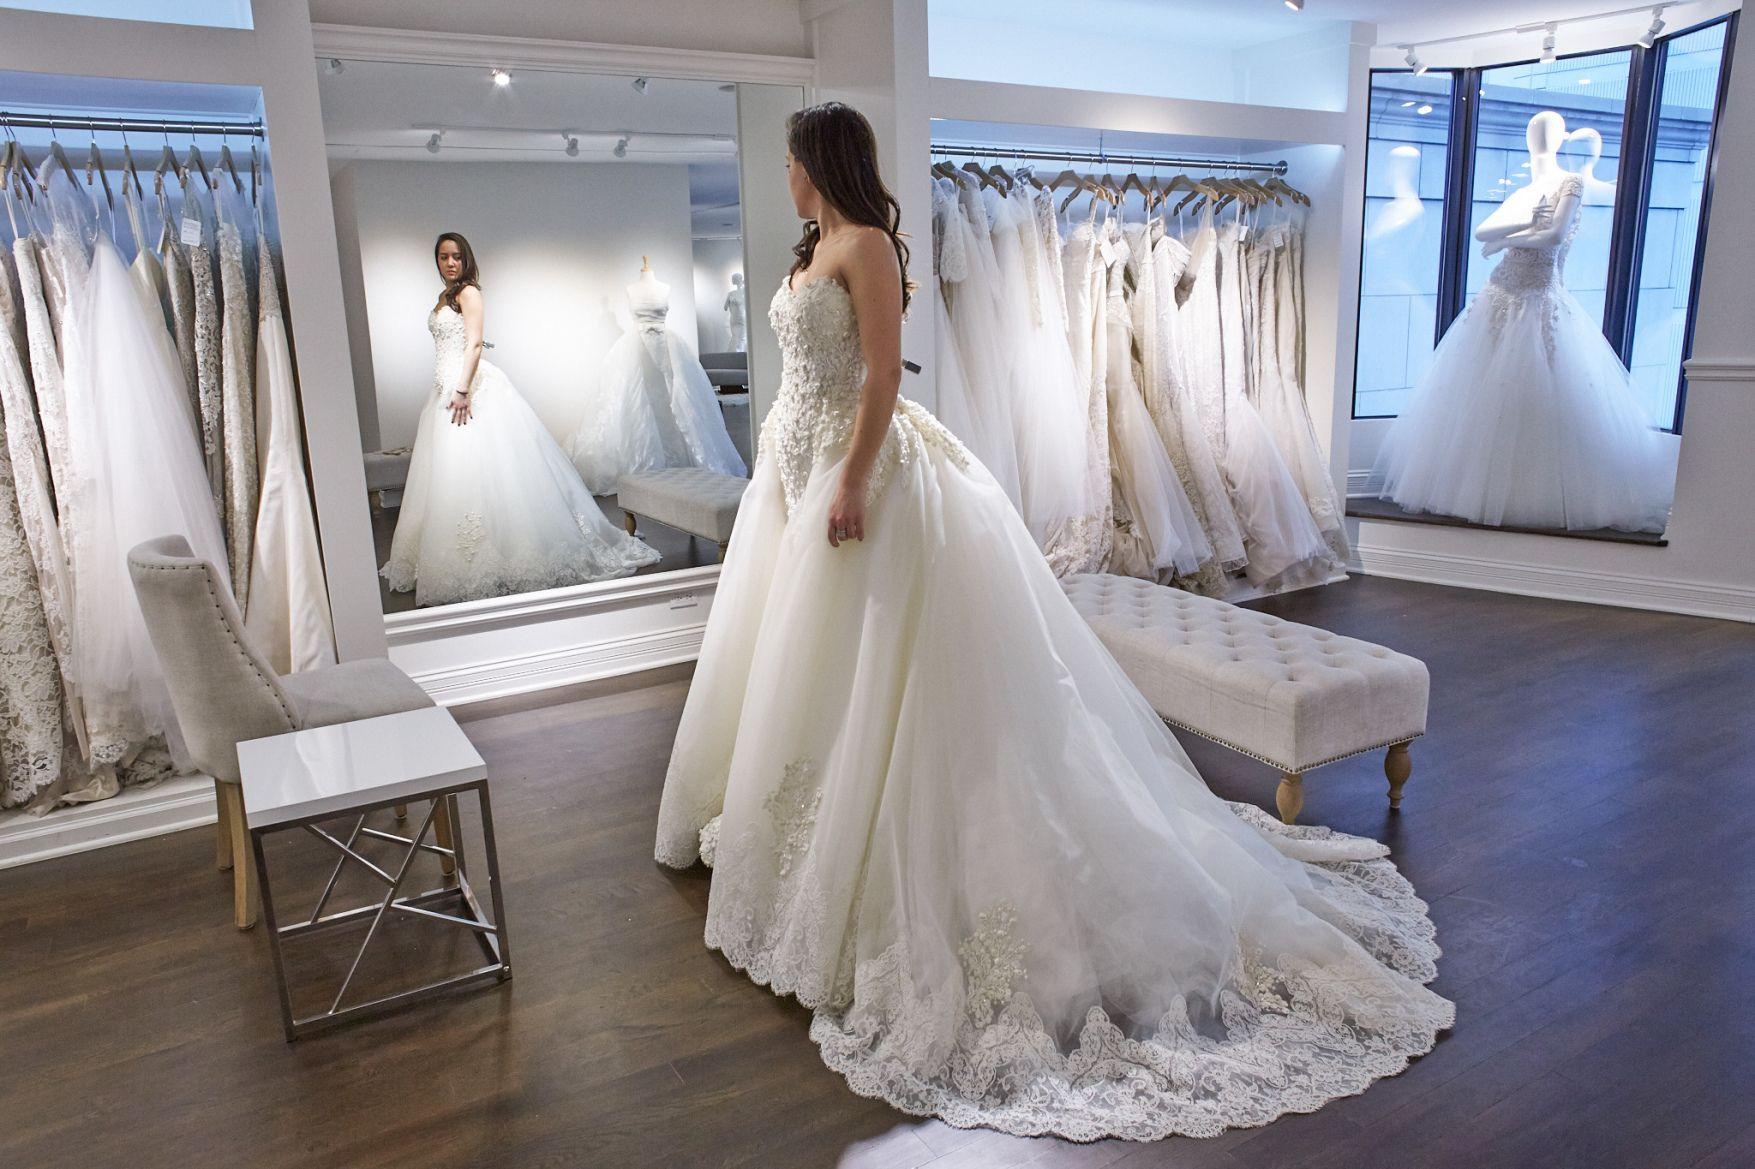 55+ Stores that Sell Wedding Dresses - Dressy Dresses for Weddings ...